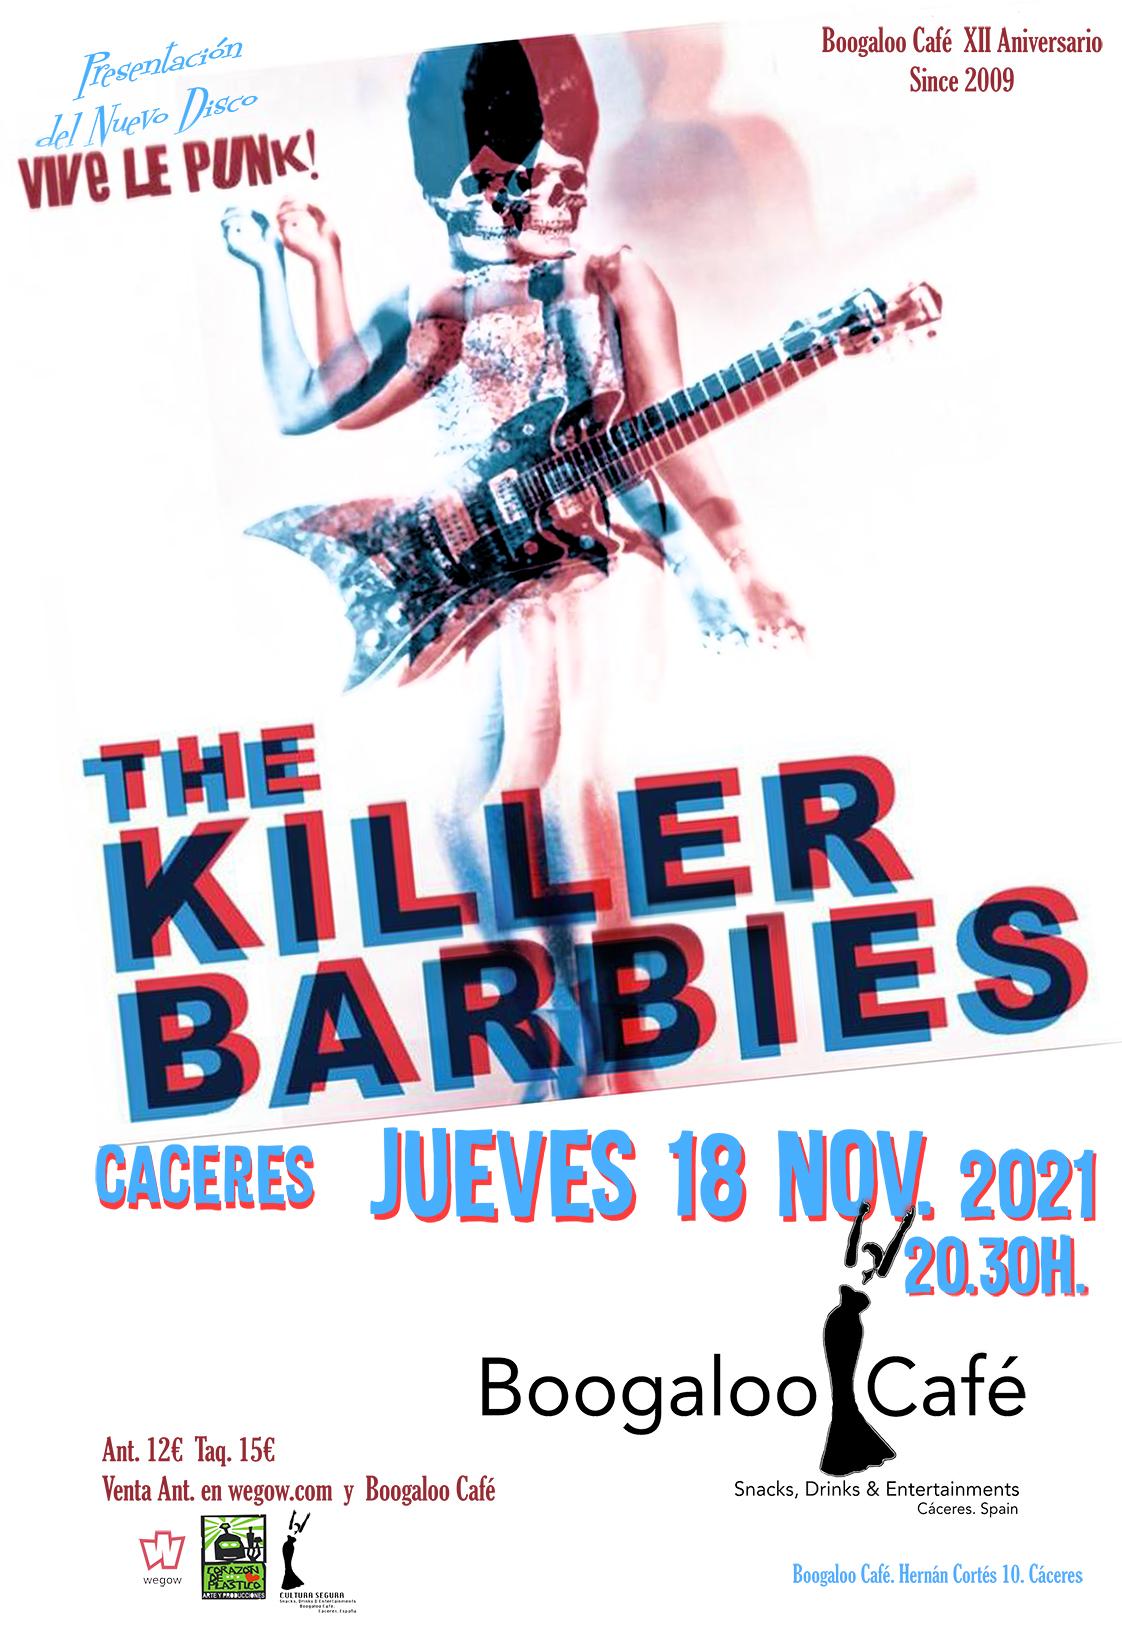 killer barbies concierto en boogaloo cafe caceres 16348229961724029